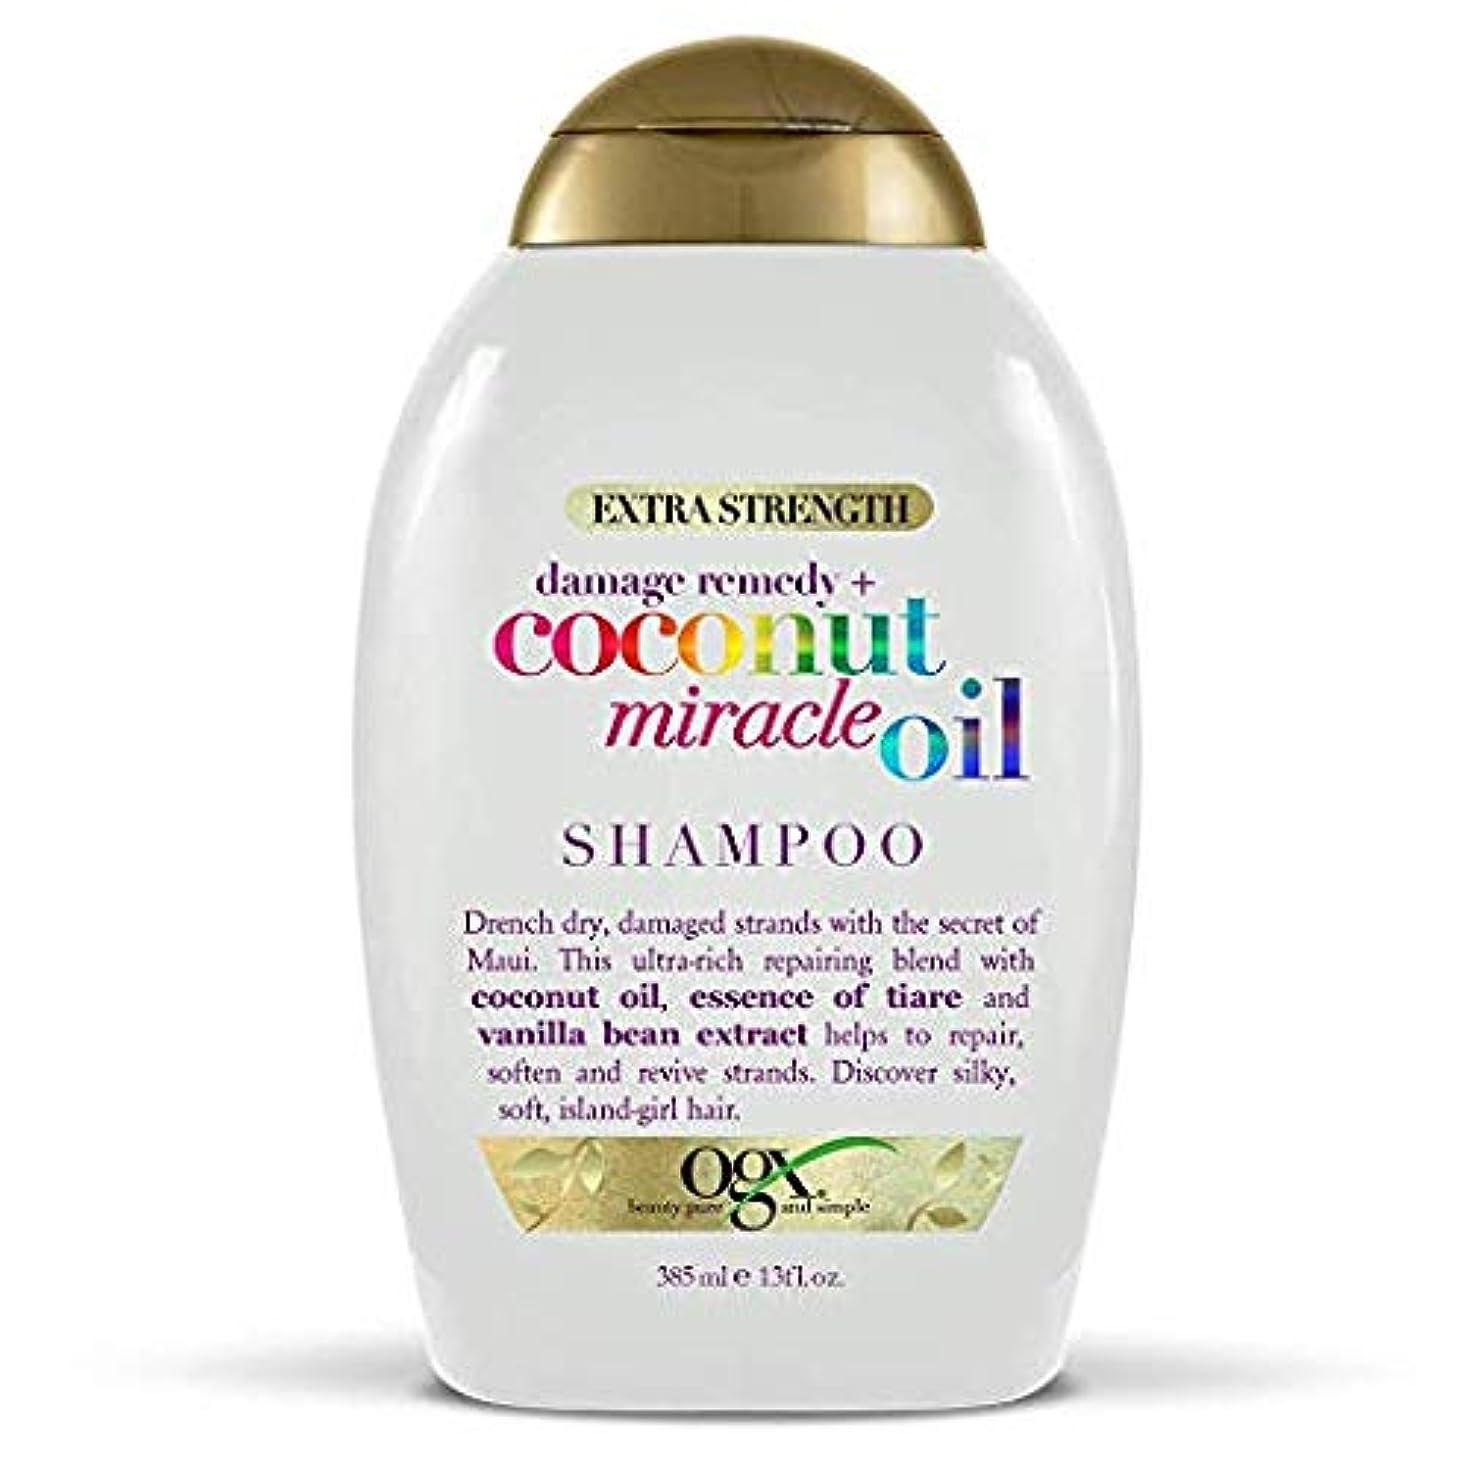 Ogx Shampoo Coconut Miracle Oil Extra Strength 13oz OGX ココナッツミラクルオイル エクストラストレングス シャンプー 385ml [並行輸入品]